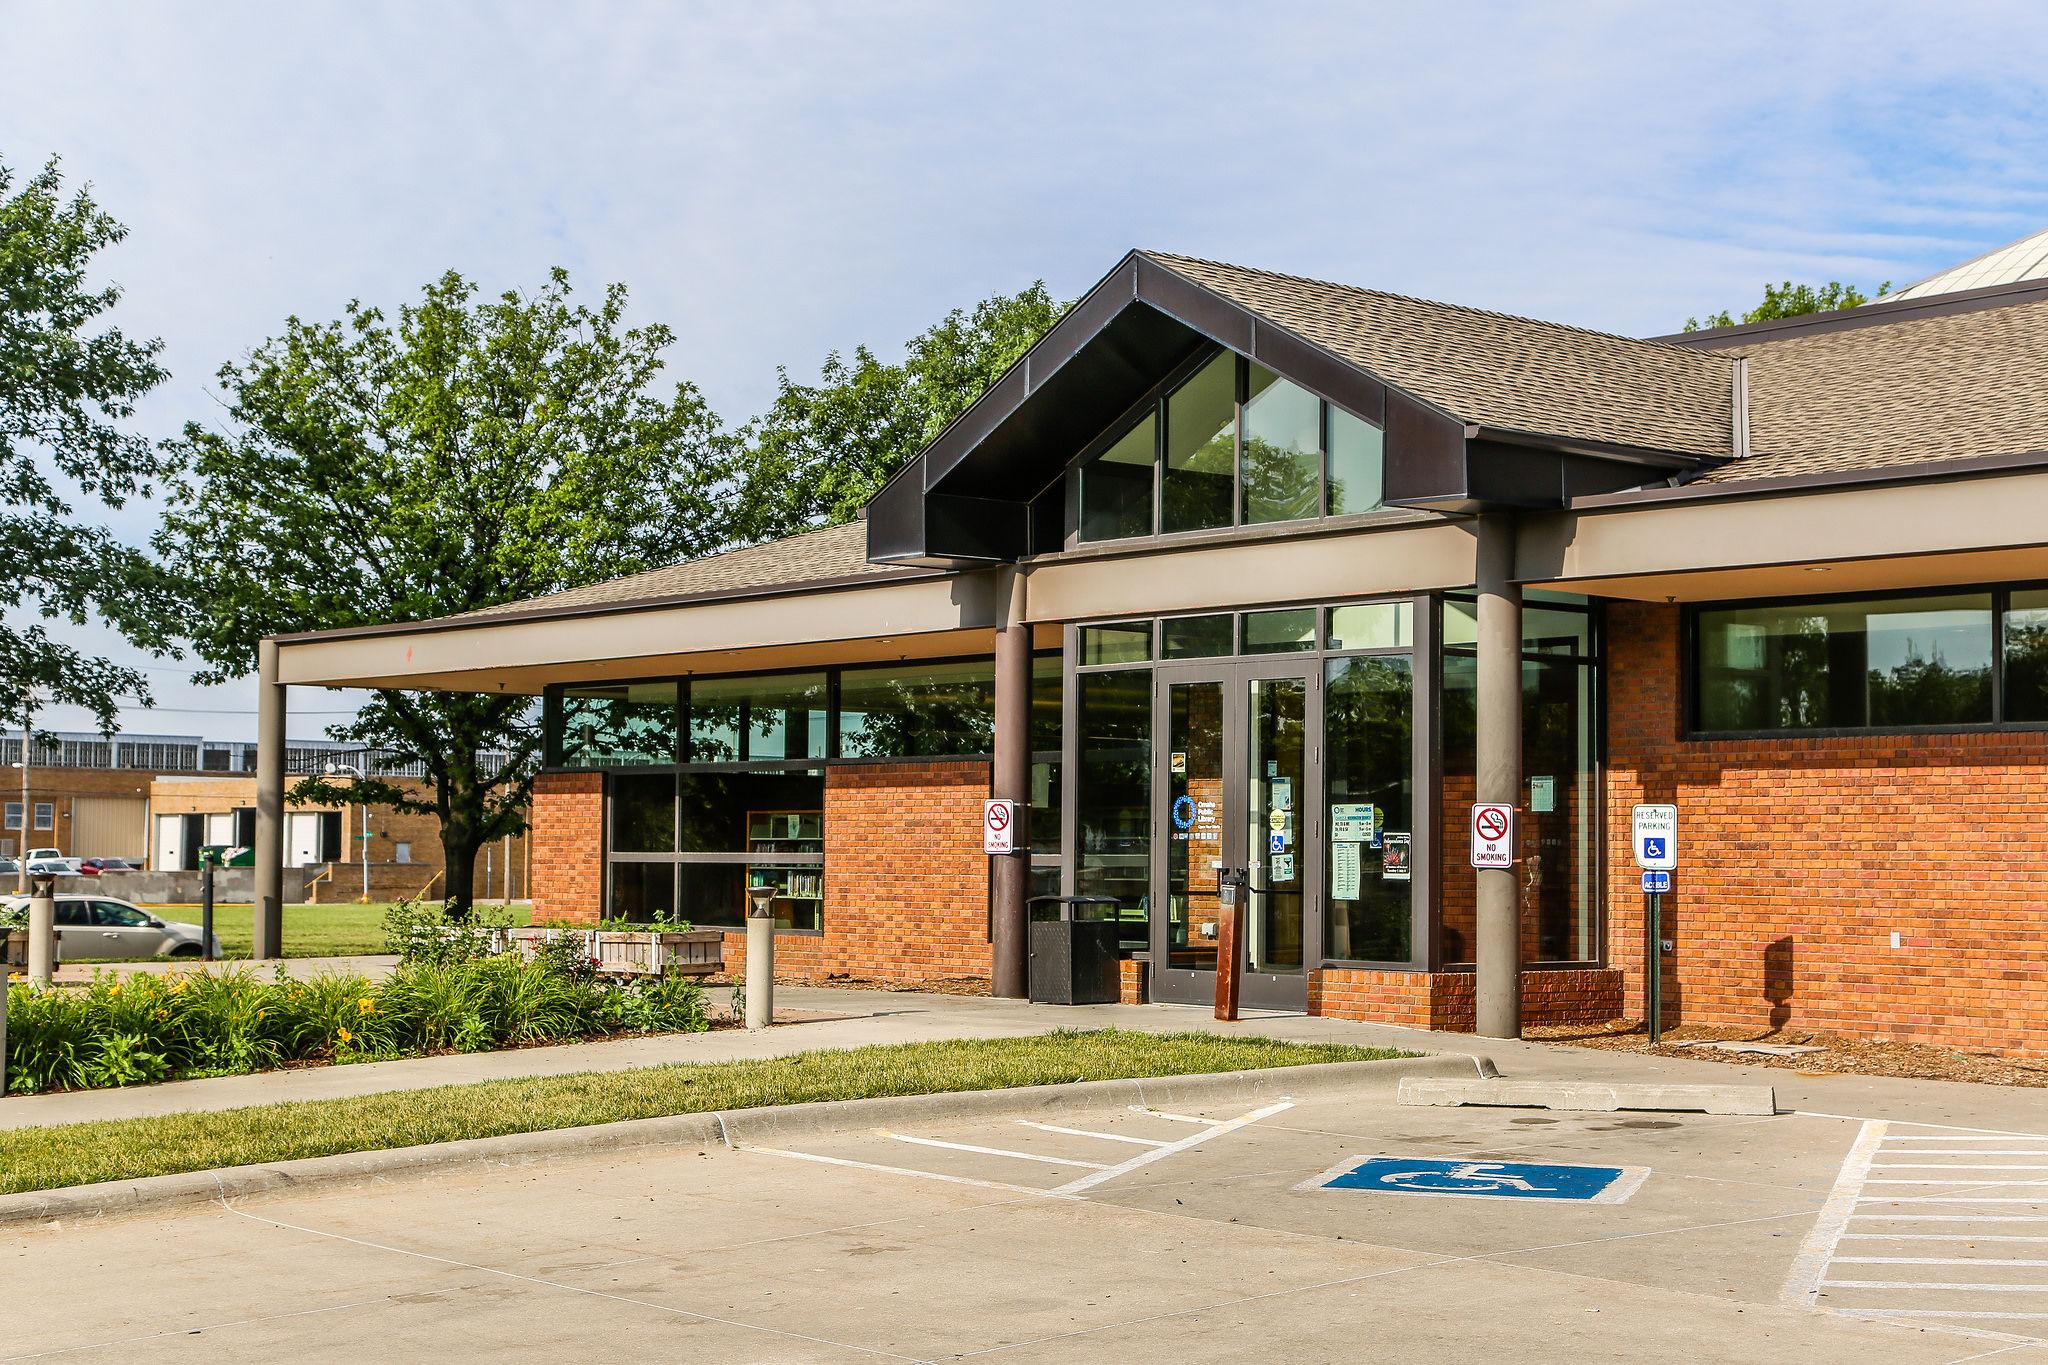 Charles B. Washington Branch Omaha Public Library, 2868 Ames Avenue, North Omaha, Nebraska